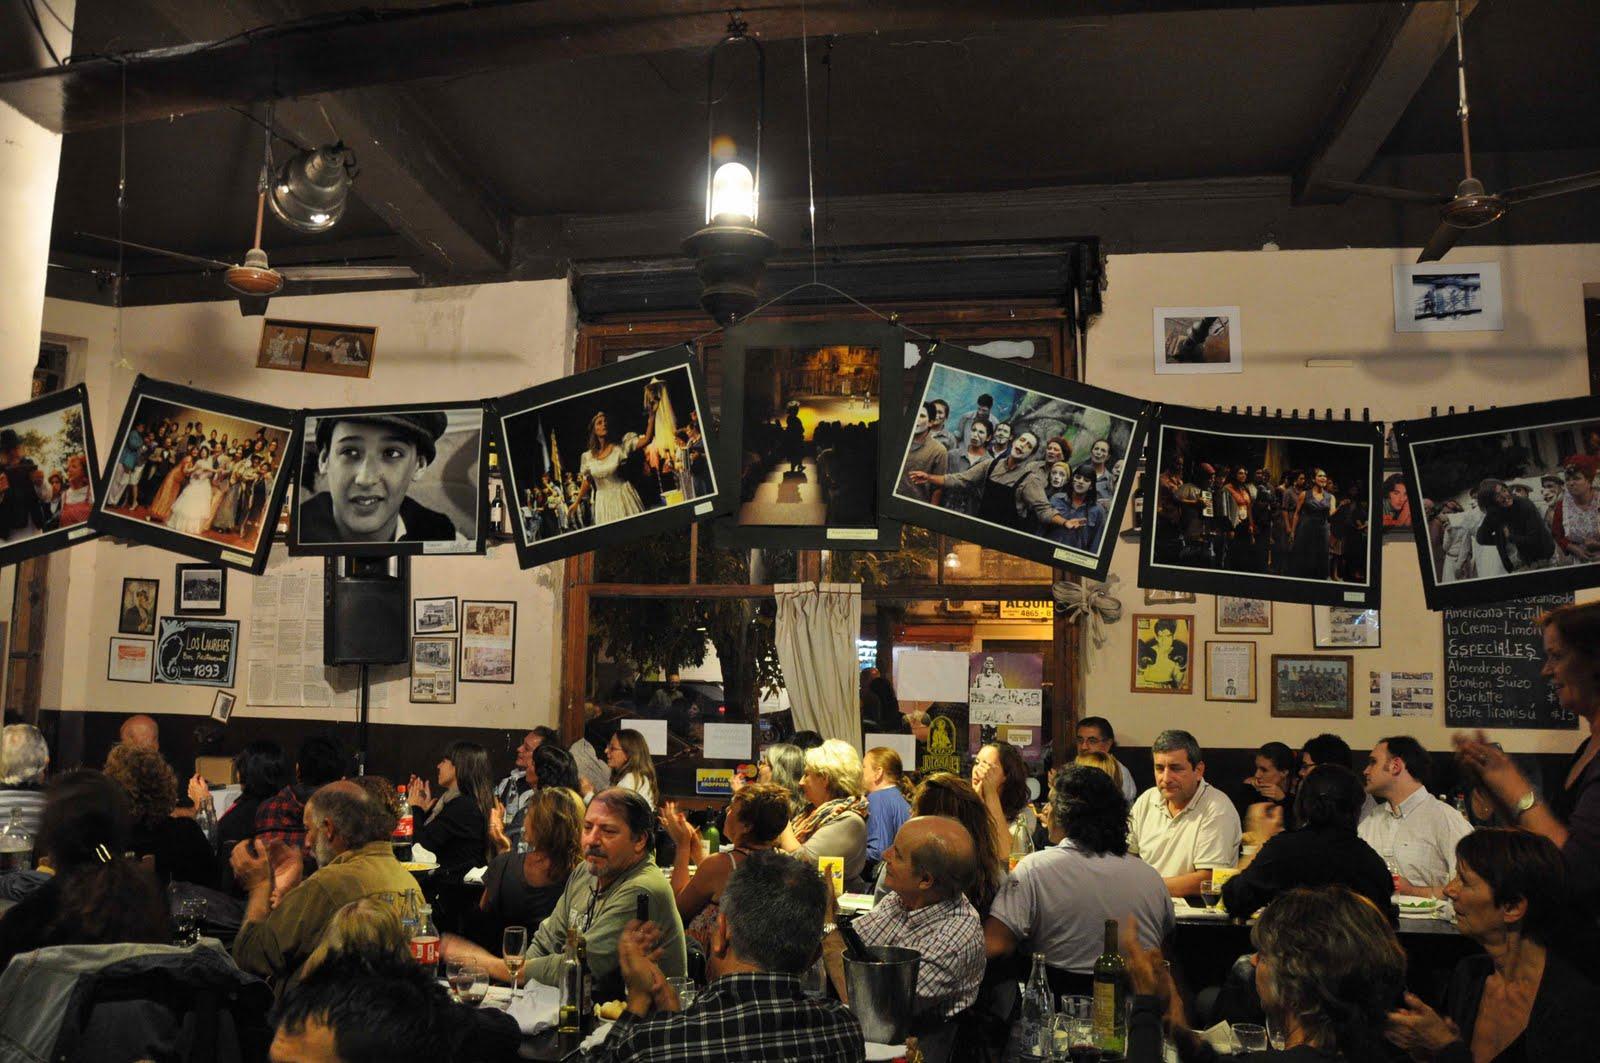 escutar tango em Buenos Aires tango los laureles